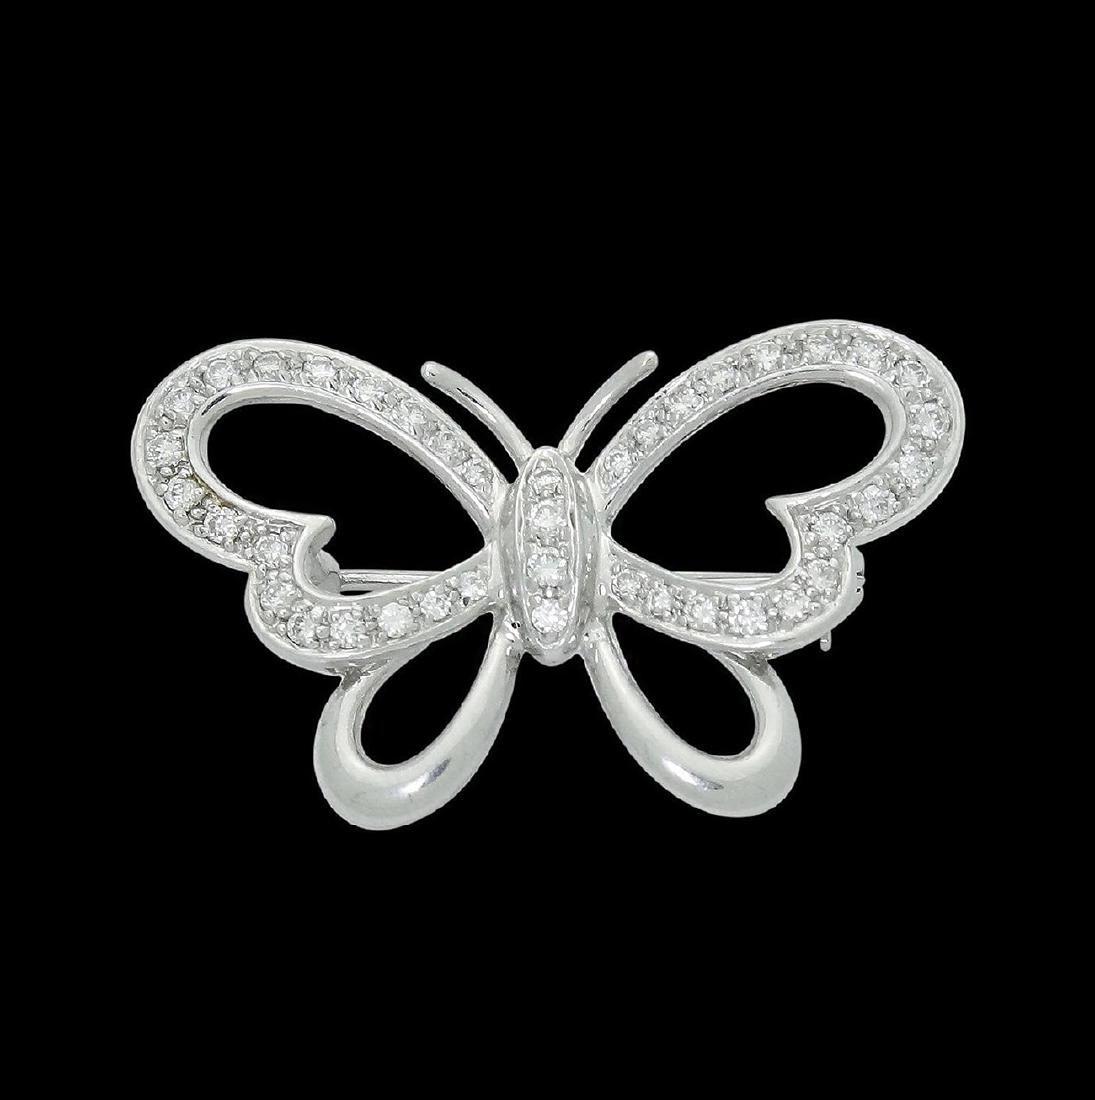 Craig Drake 18k & 0.50 VS G-H Diamond Butterfly Pin - 2